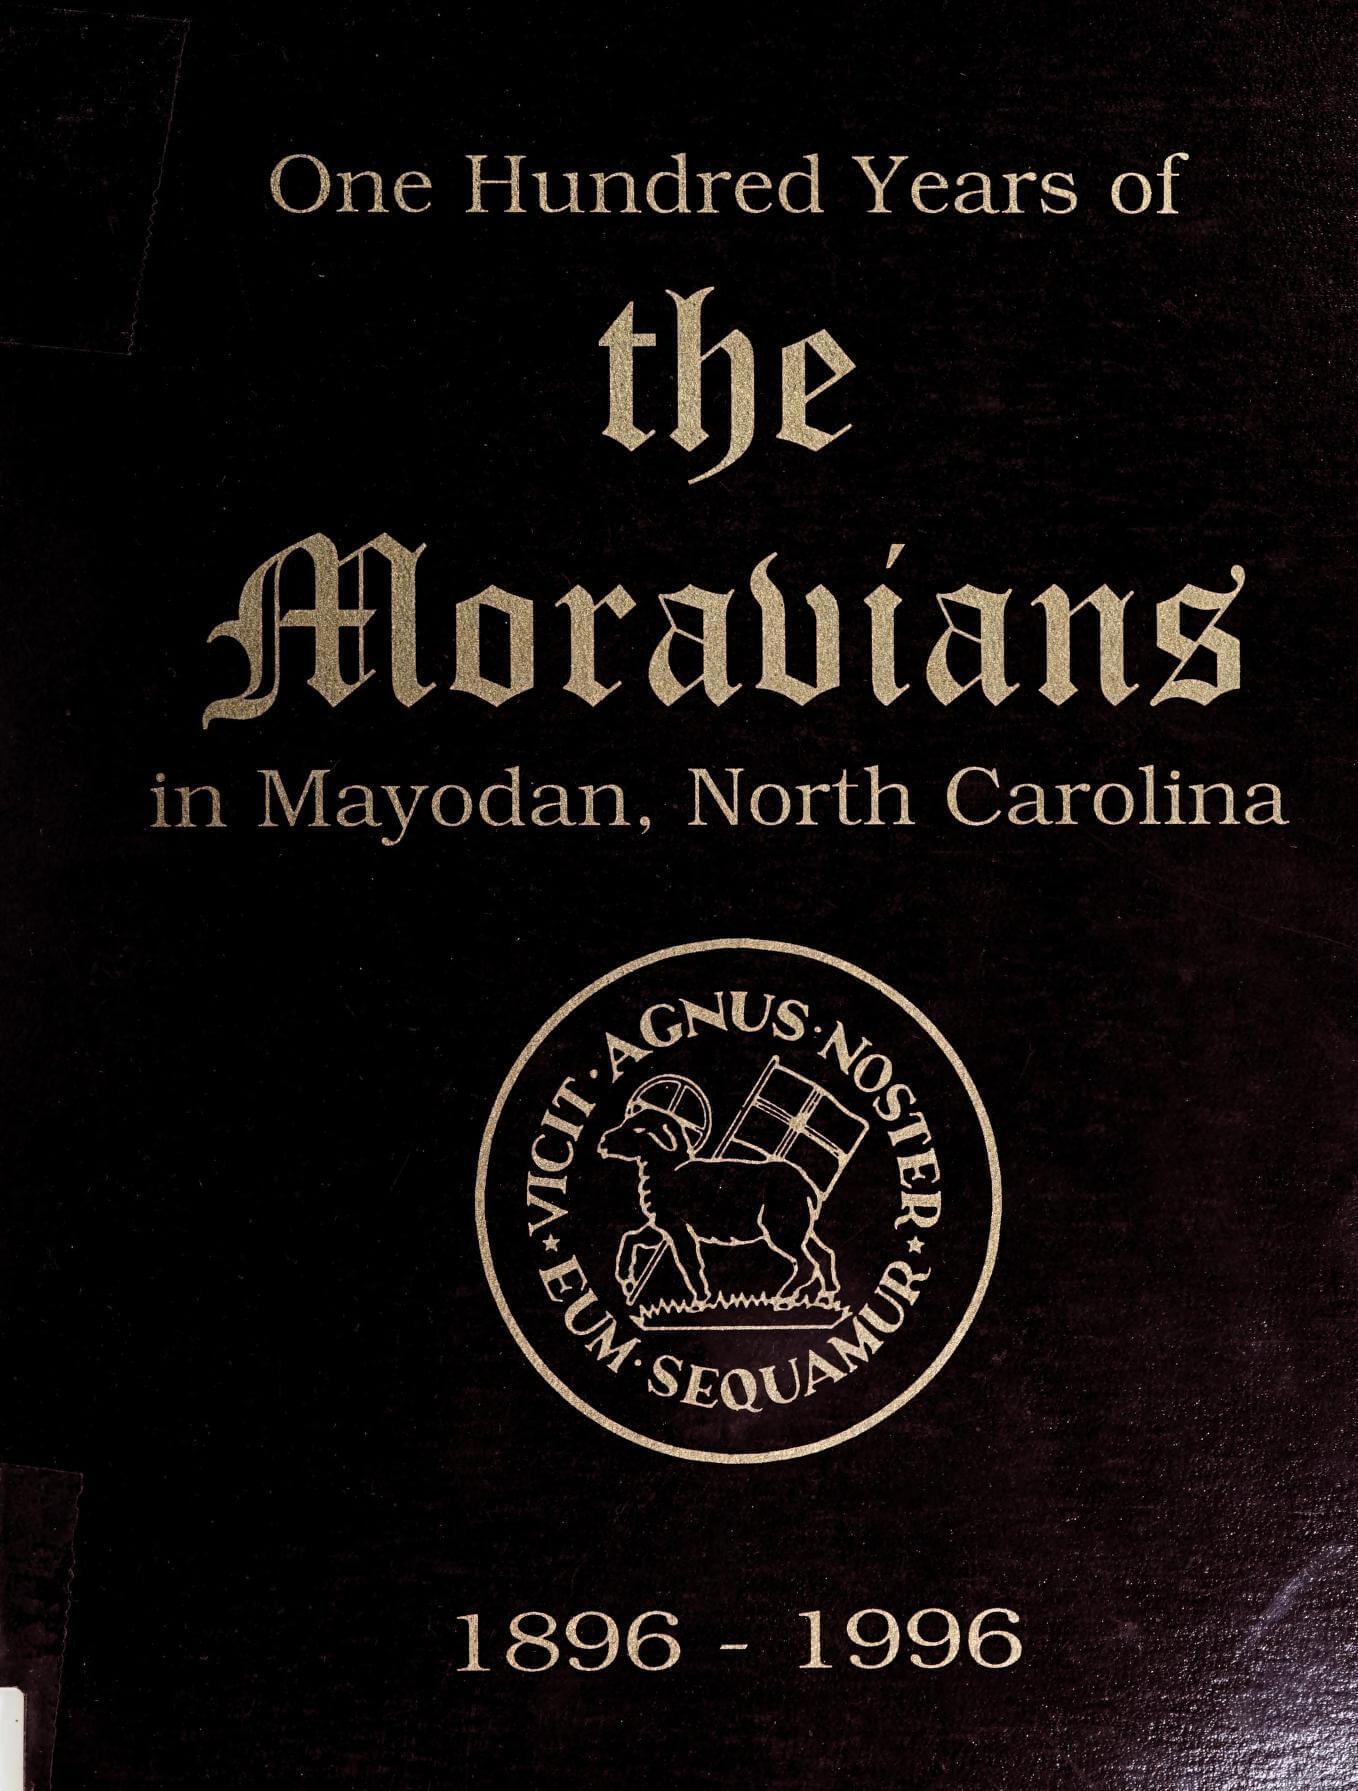 One Hundred Years of the Moravians in Mayodan, North Carolina 1896-1996